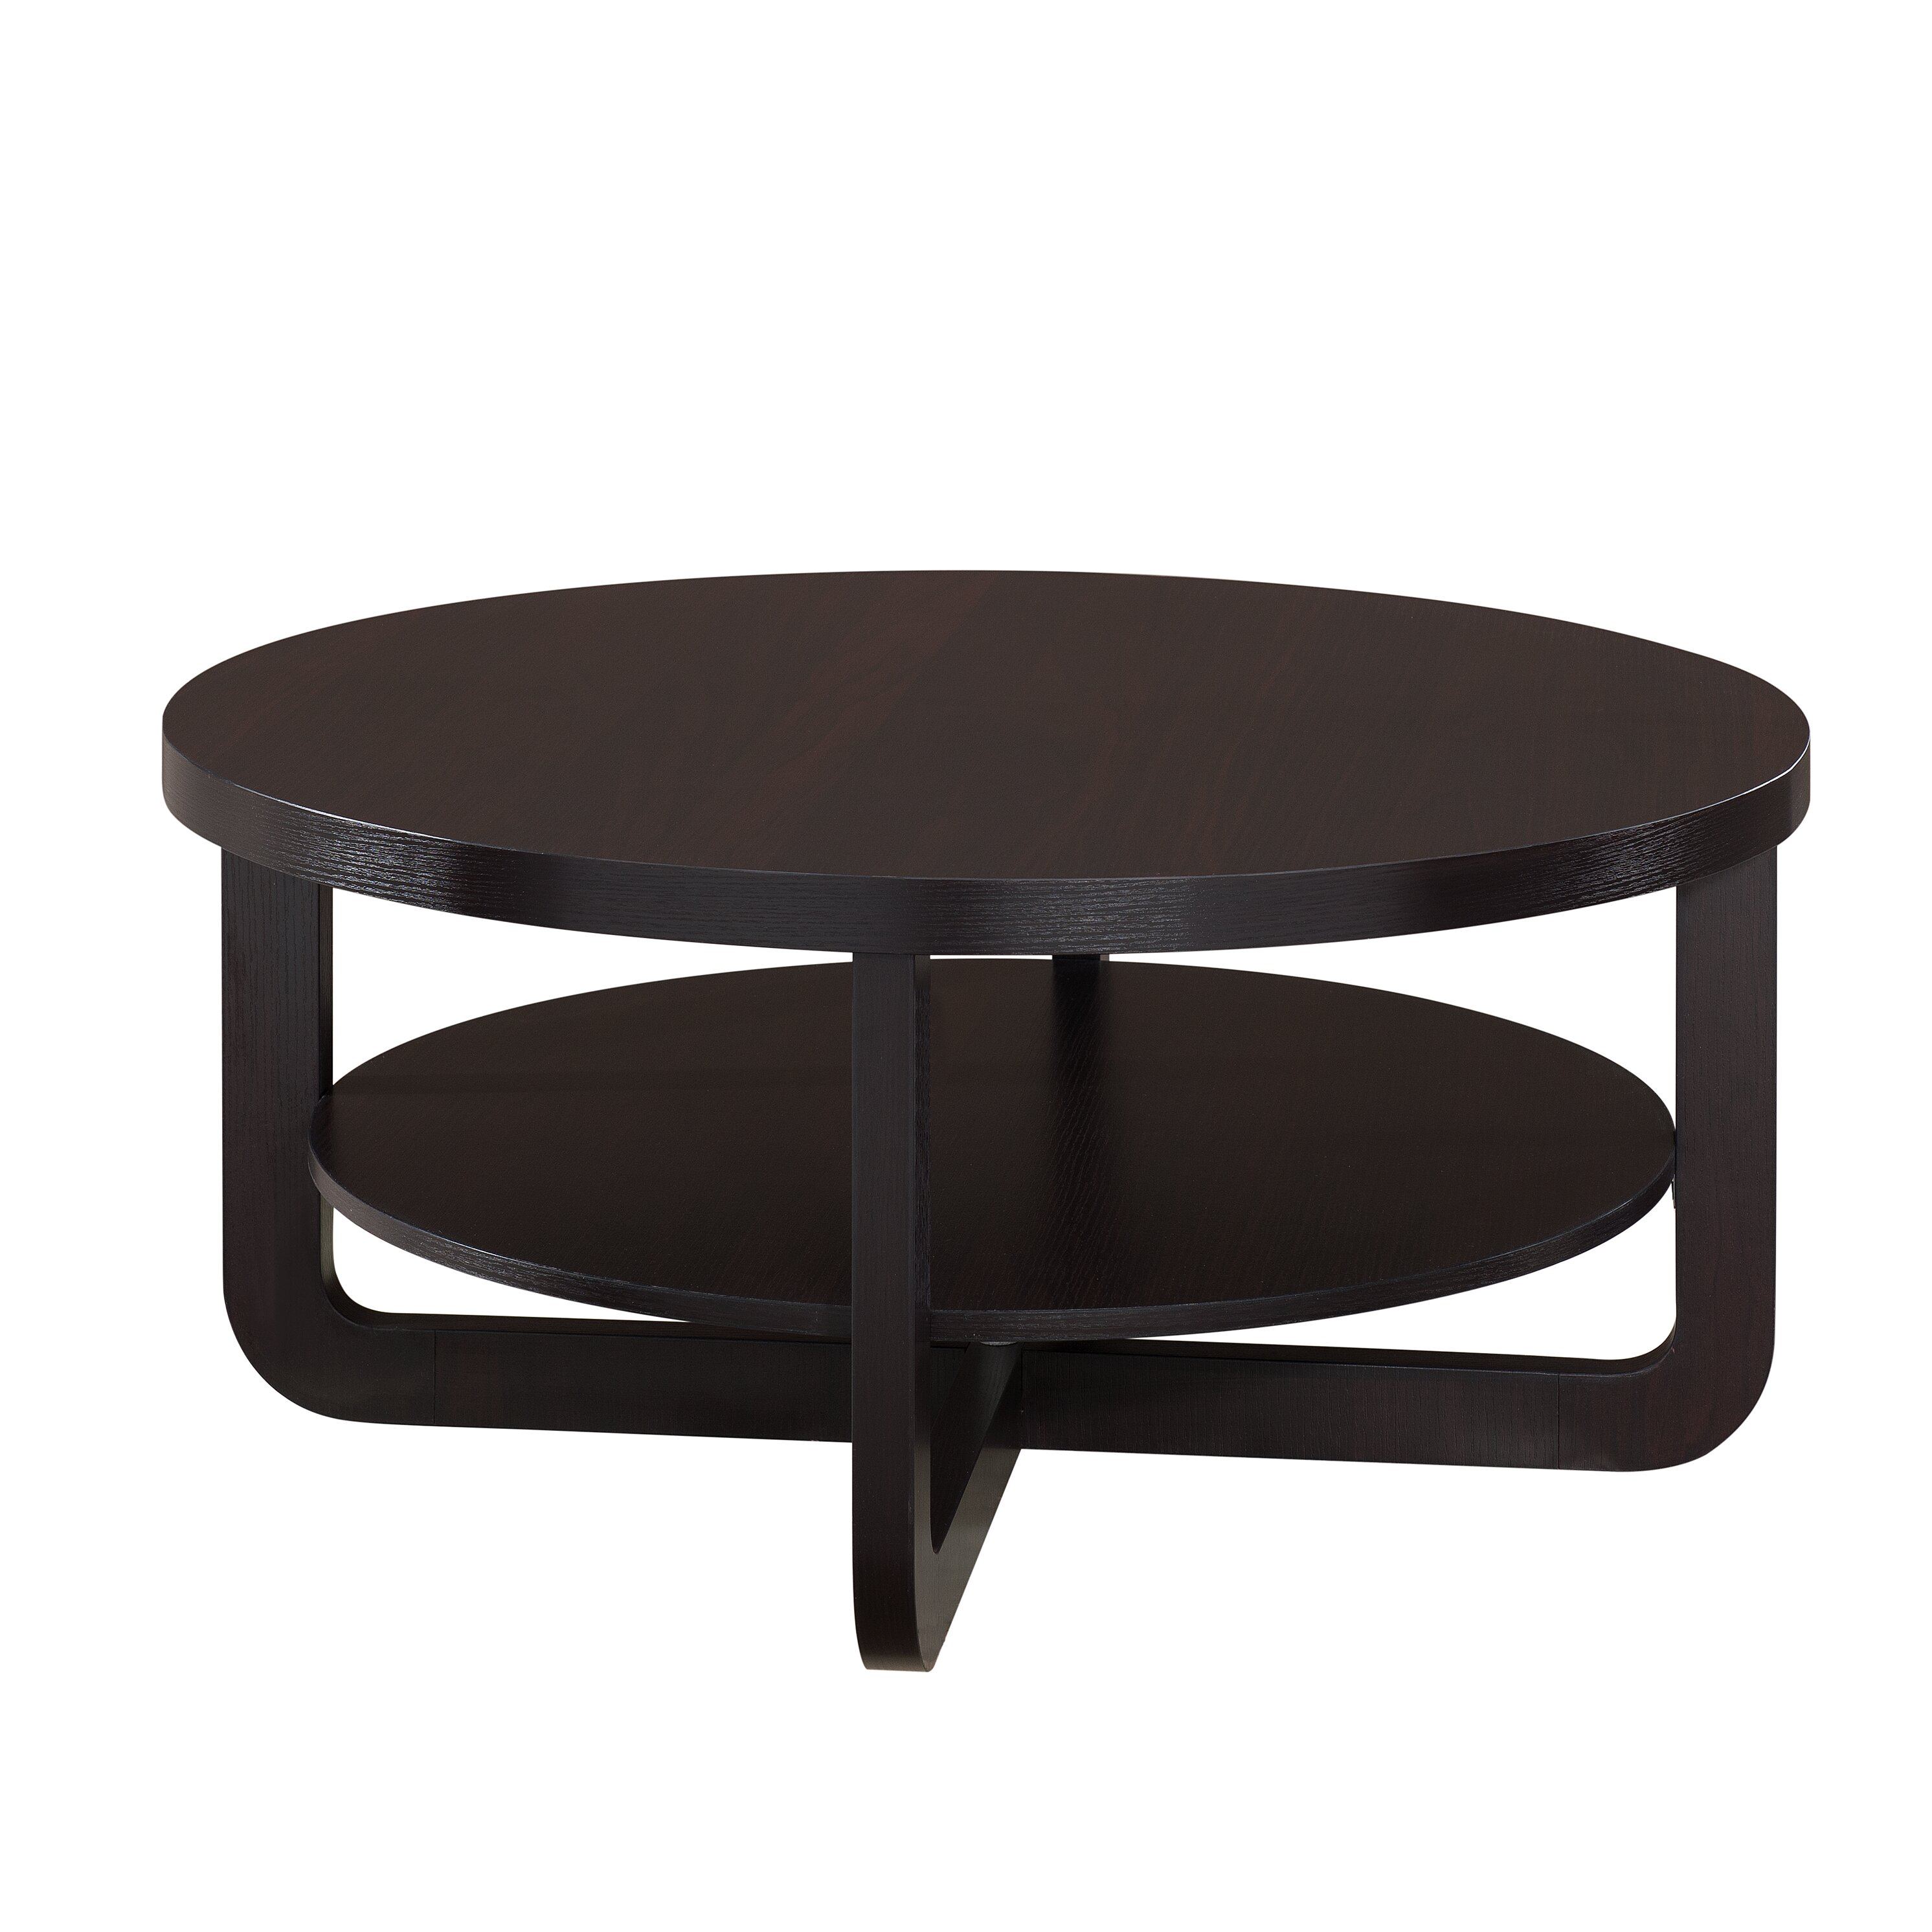 Hokku Designs Ursula Coffee Table Reviews Wayfair